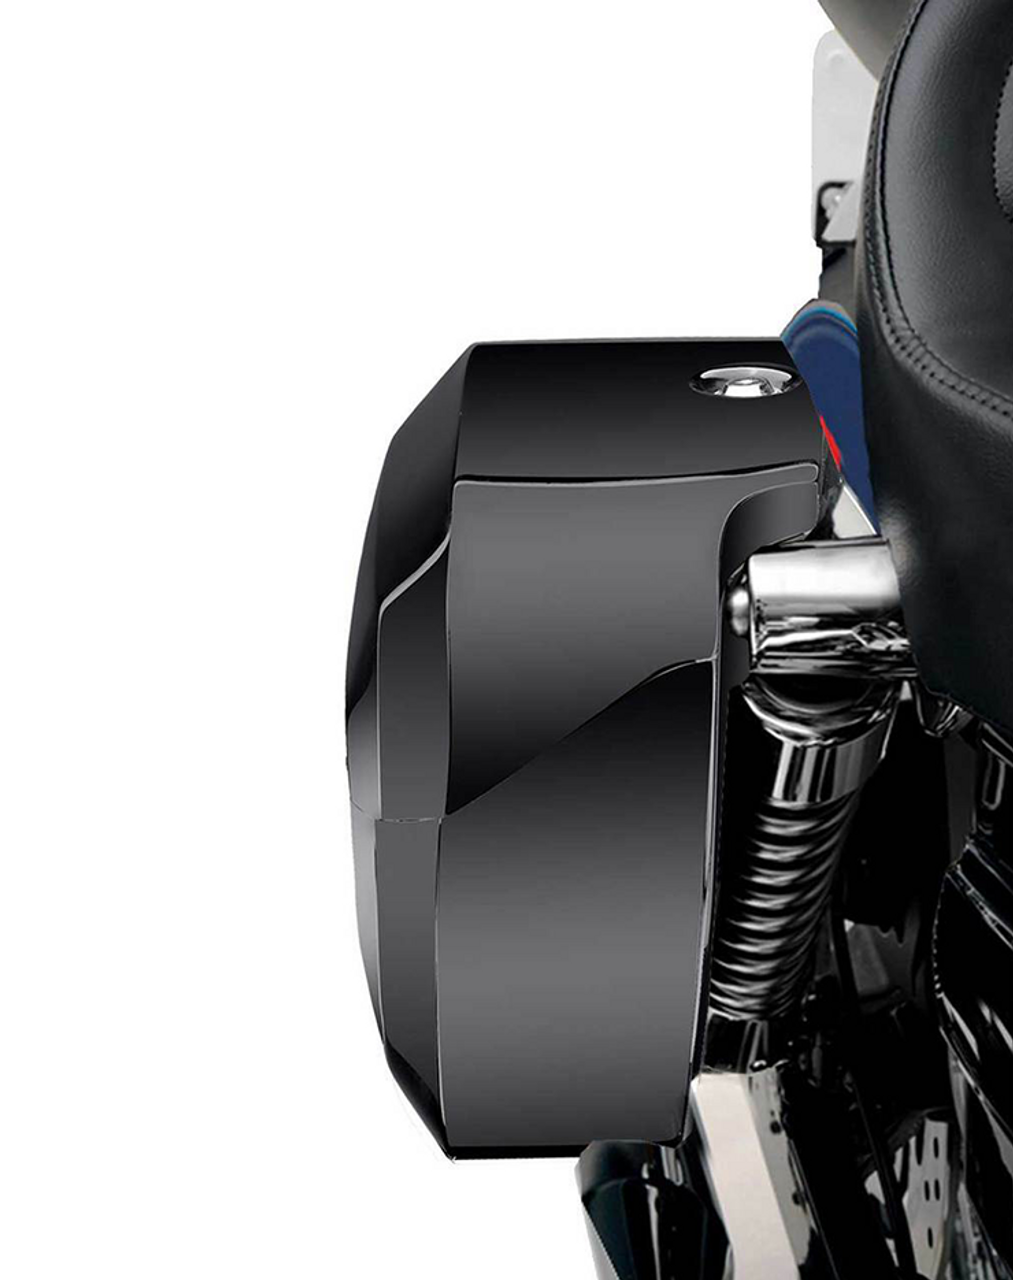 Honda VTX 1300 R Retro Viking Lamellar Large Spear Shock Cutout Hard Saddlebags Shock Cutout View